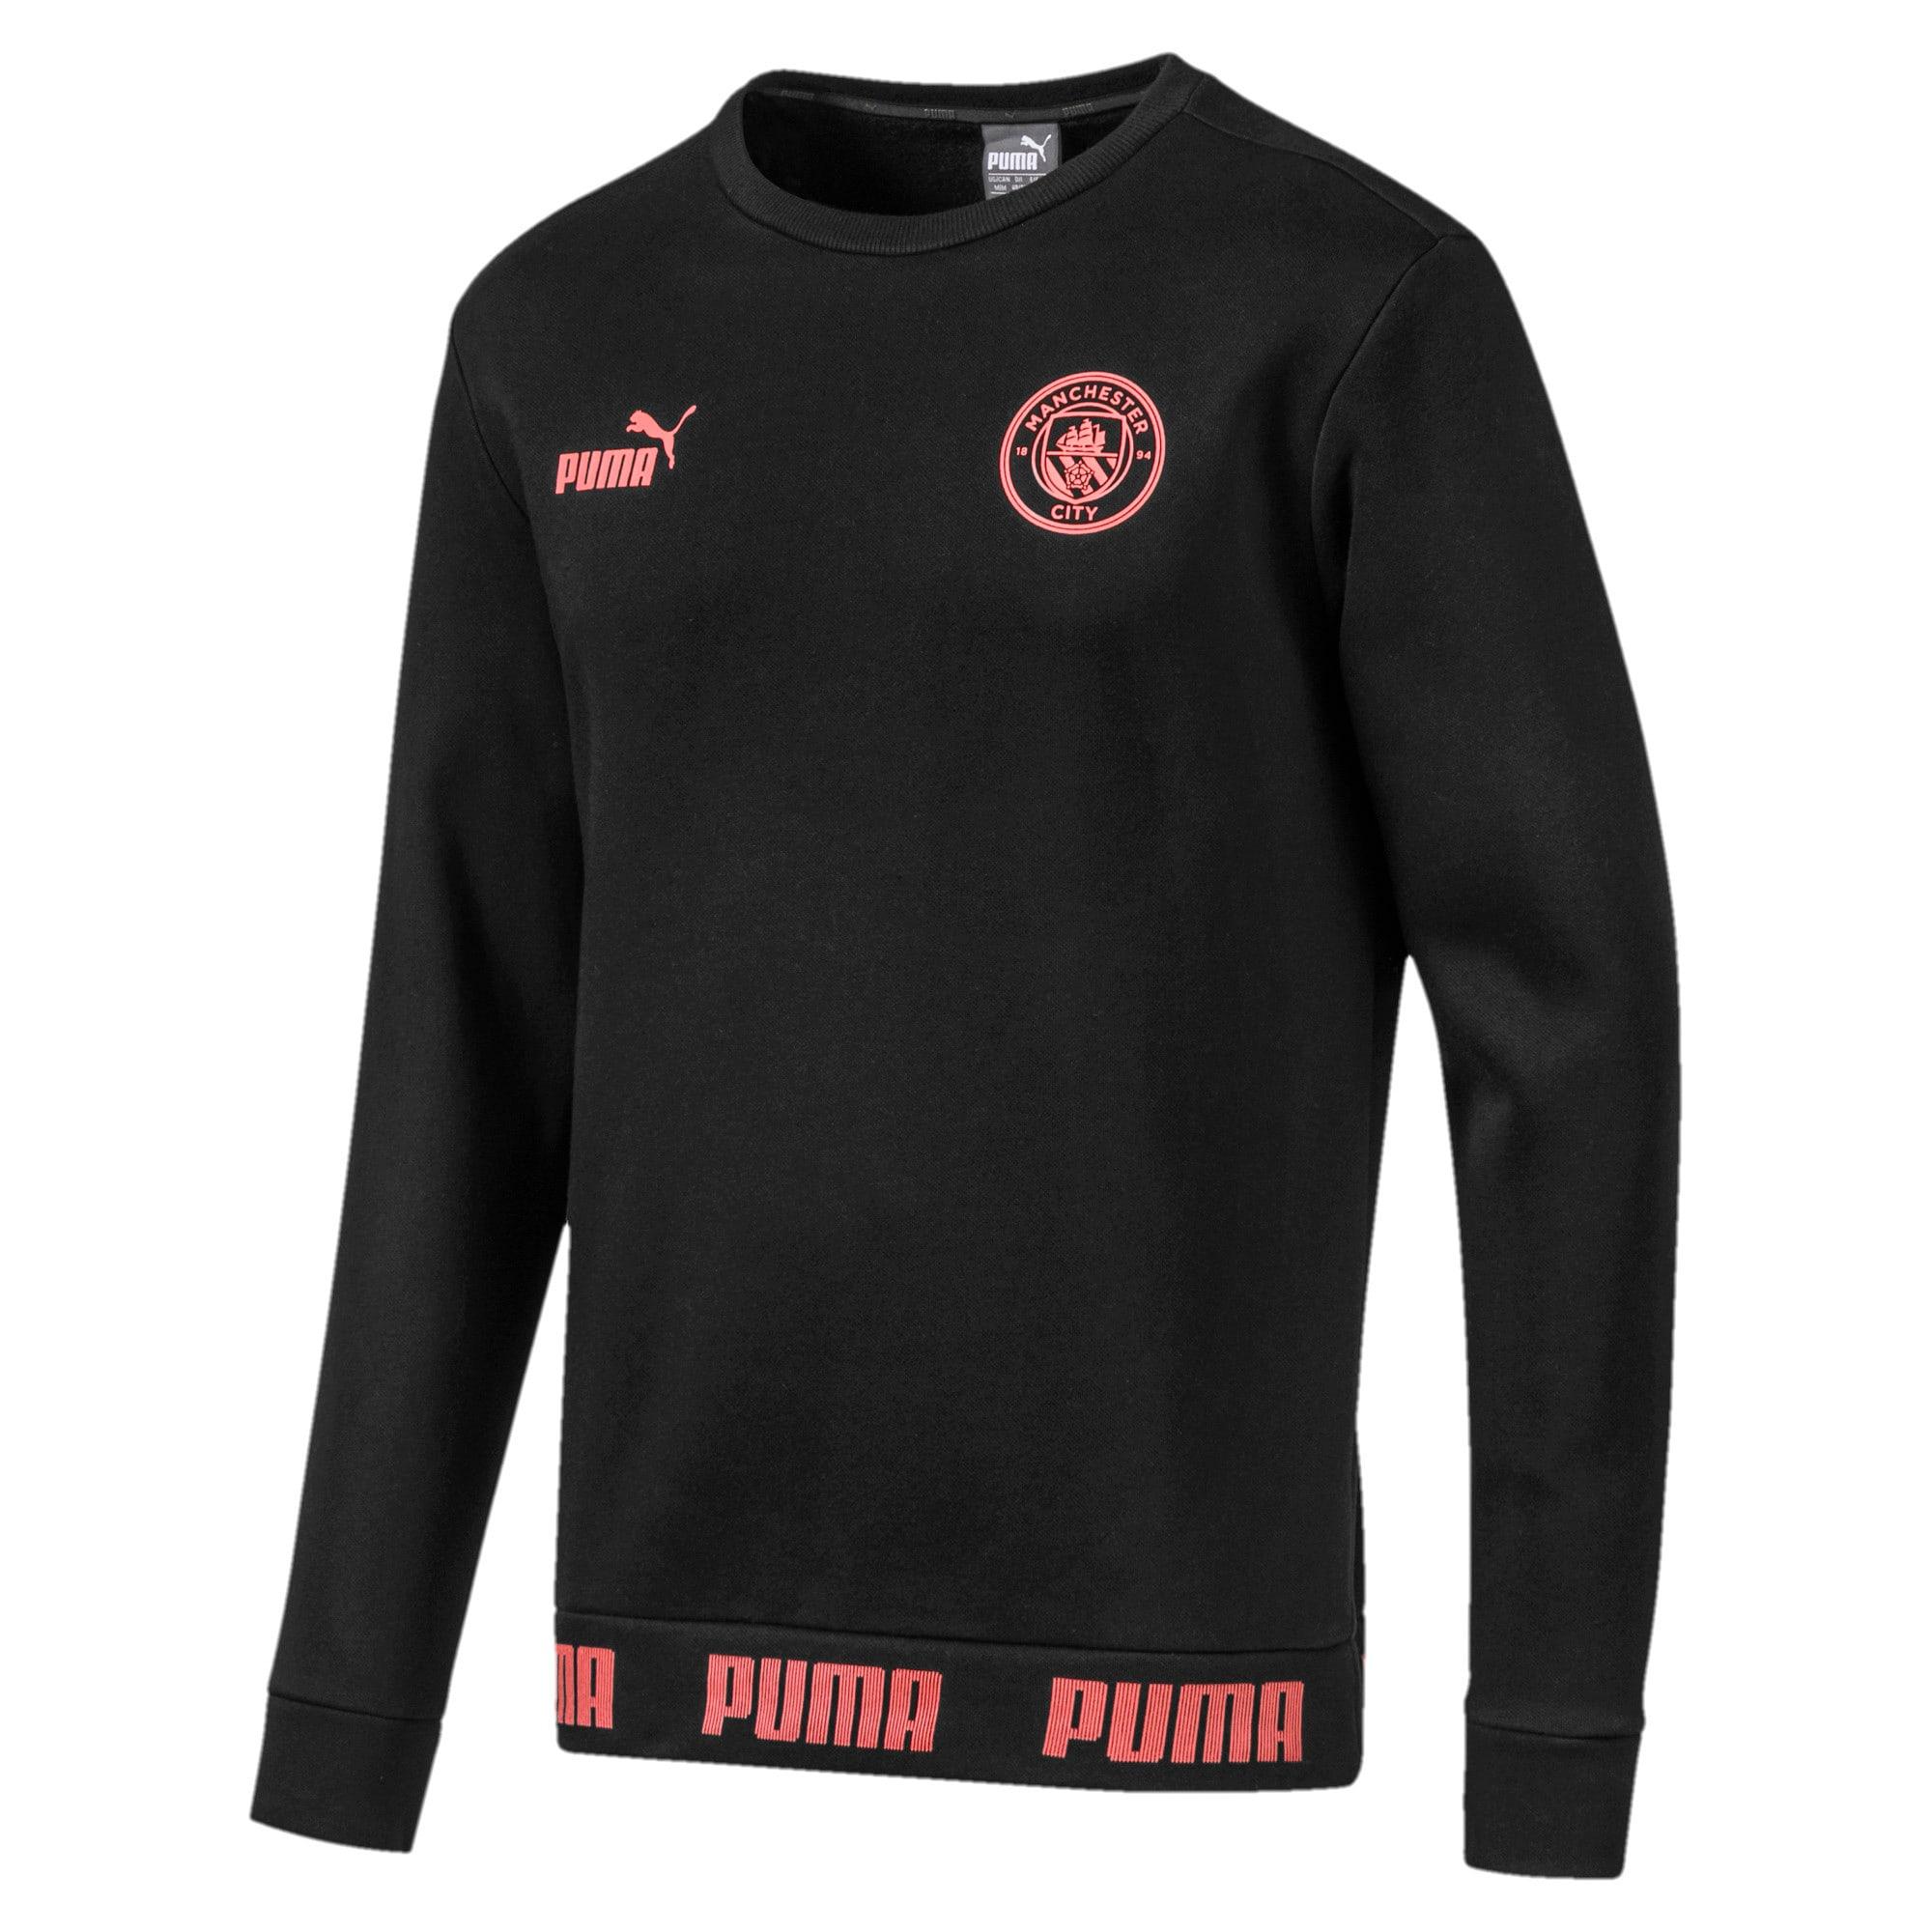 Thumbnail 1 of Manchester City FC FtblCulture Men's Sweatshirt, Puma Black-Georgia Peach, medium